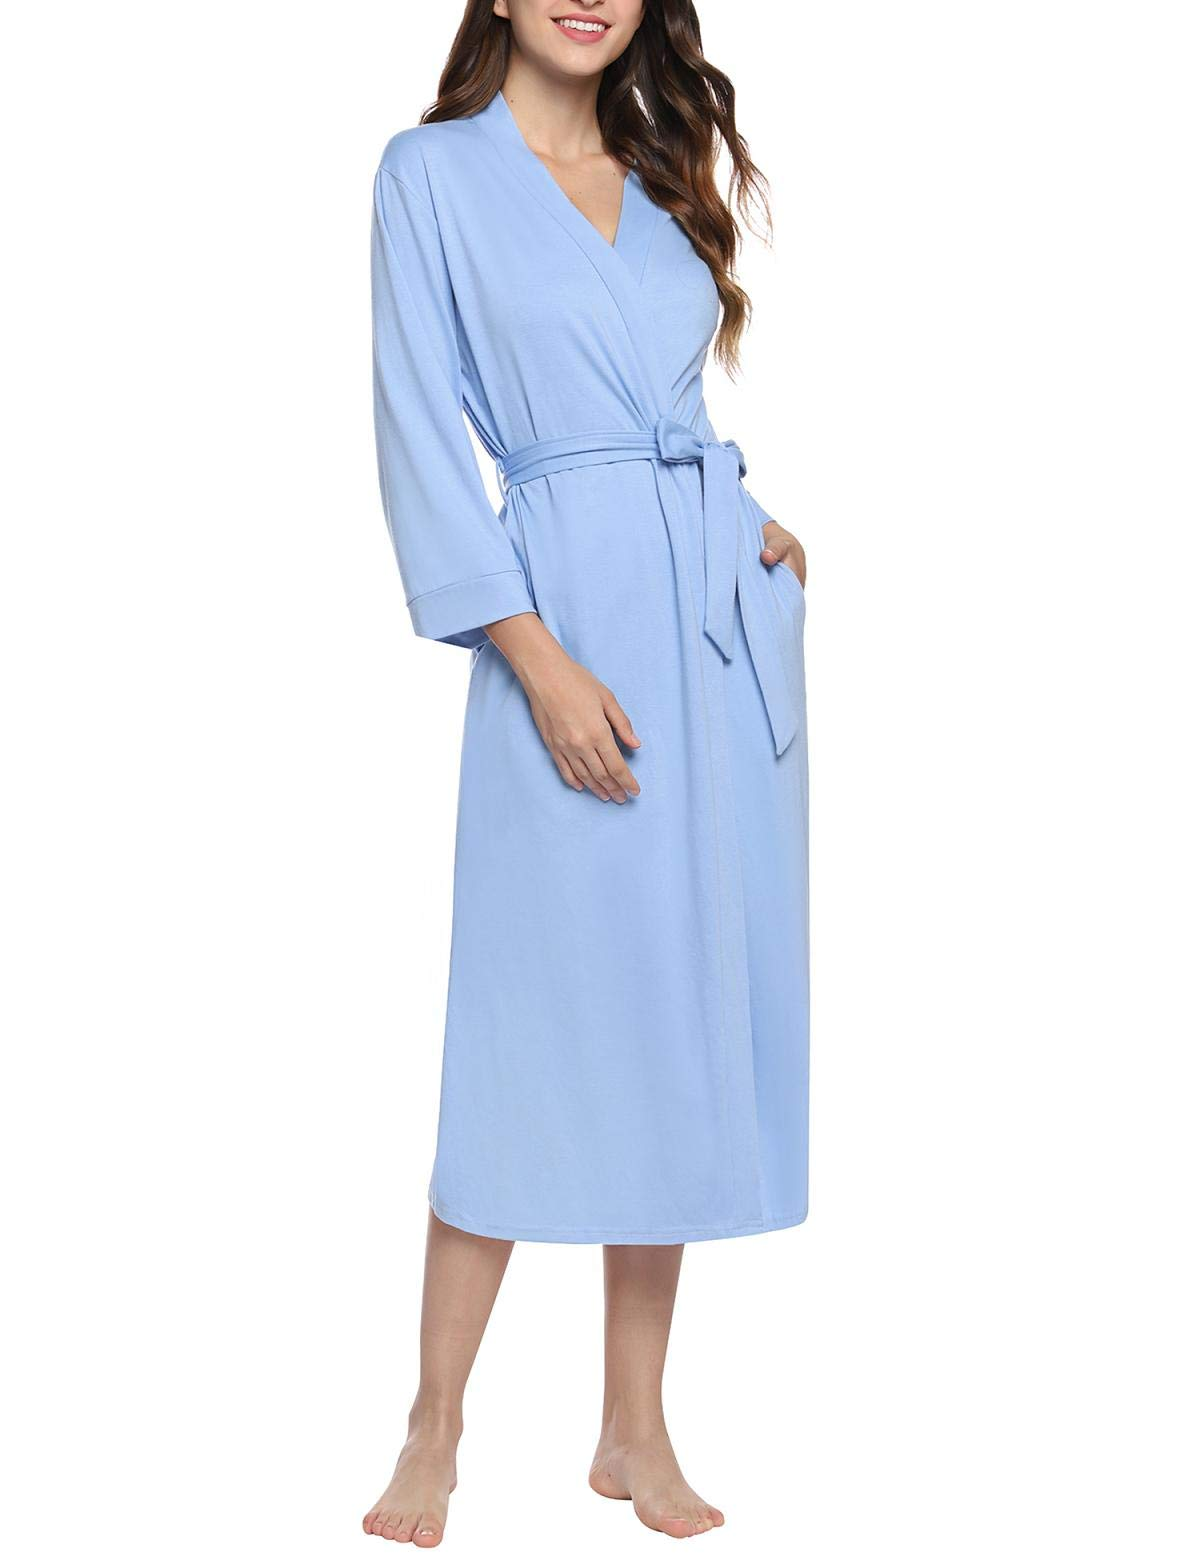 Abollria Women Kimono Robes Cotton Long Bathrobe Lightweight Sleepwear Soft Lounge Robe with Pocket